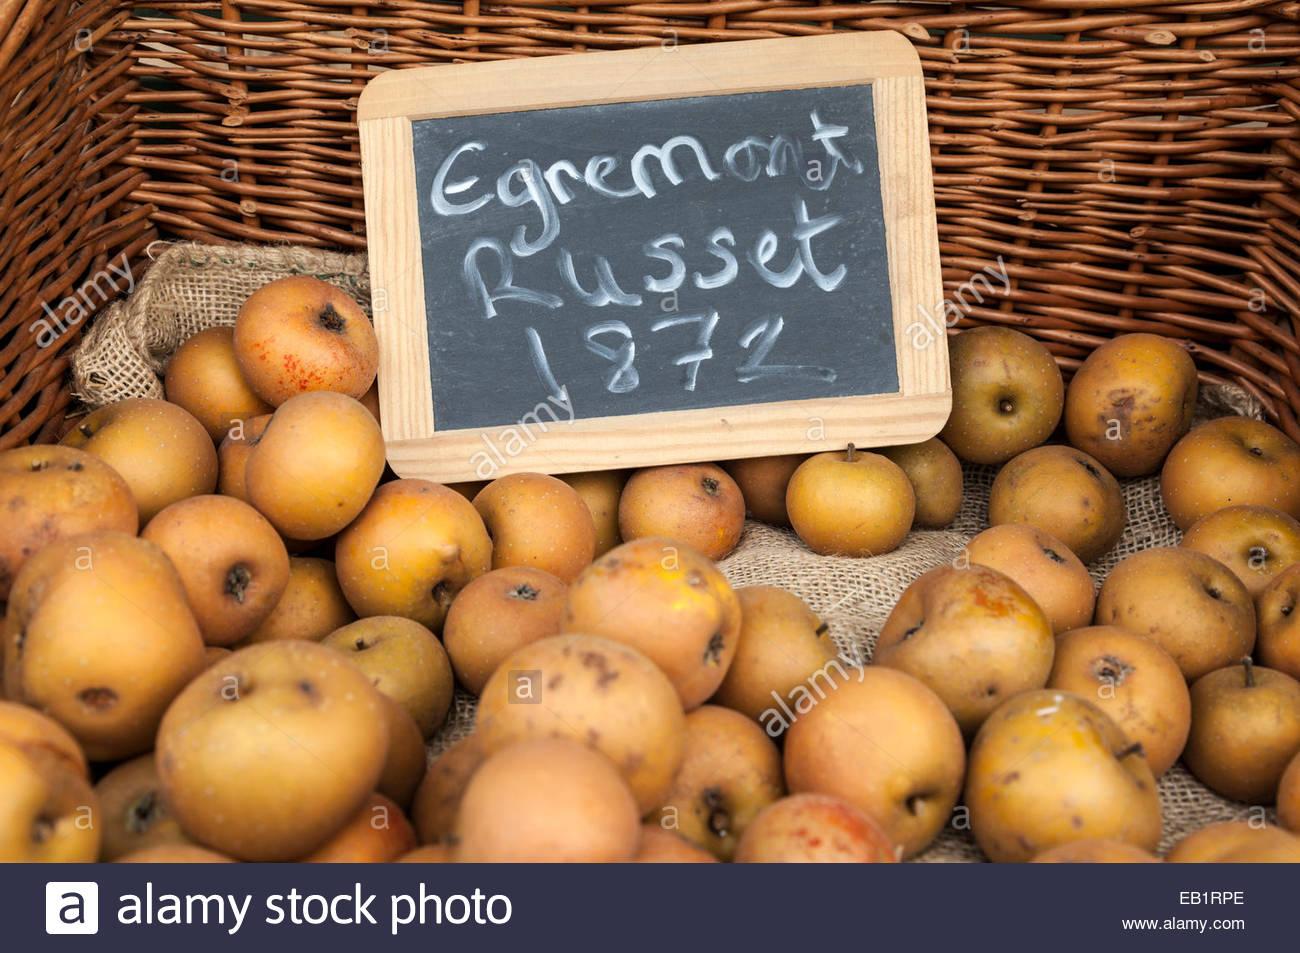 Egremont Russet Apples - Stock Image